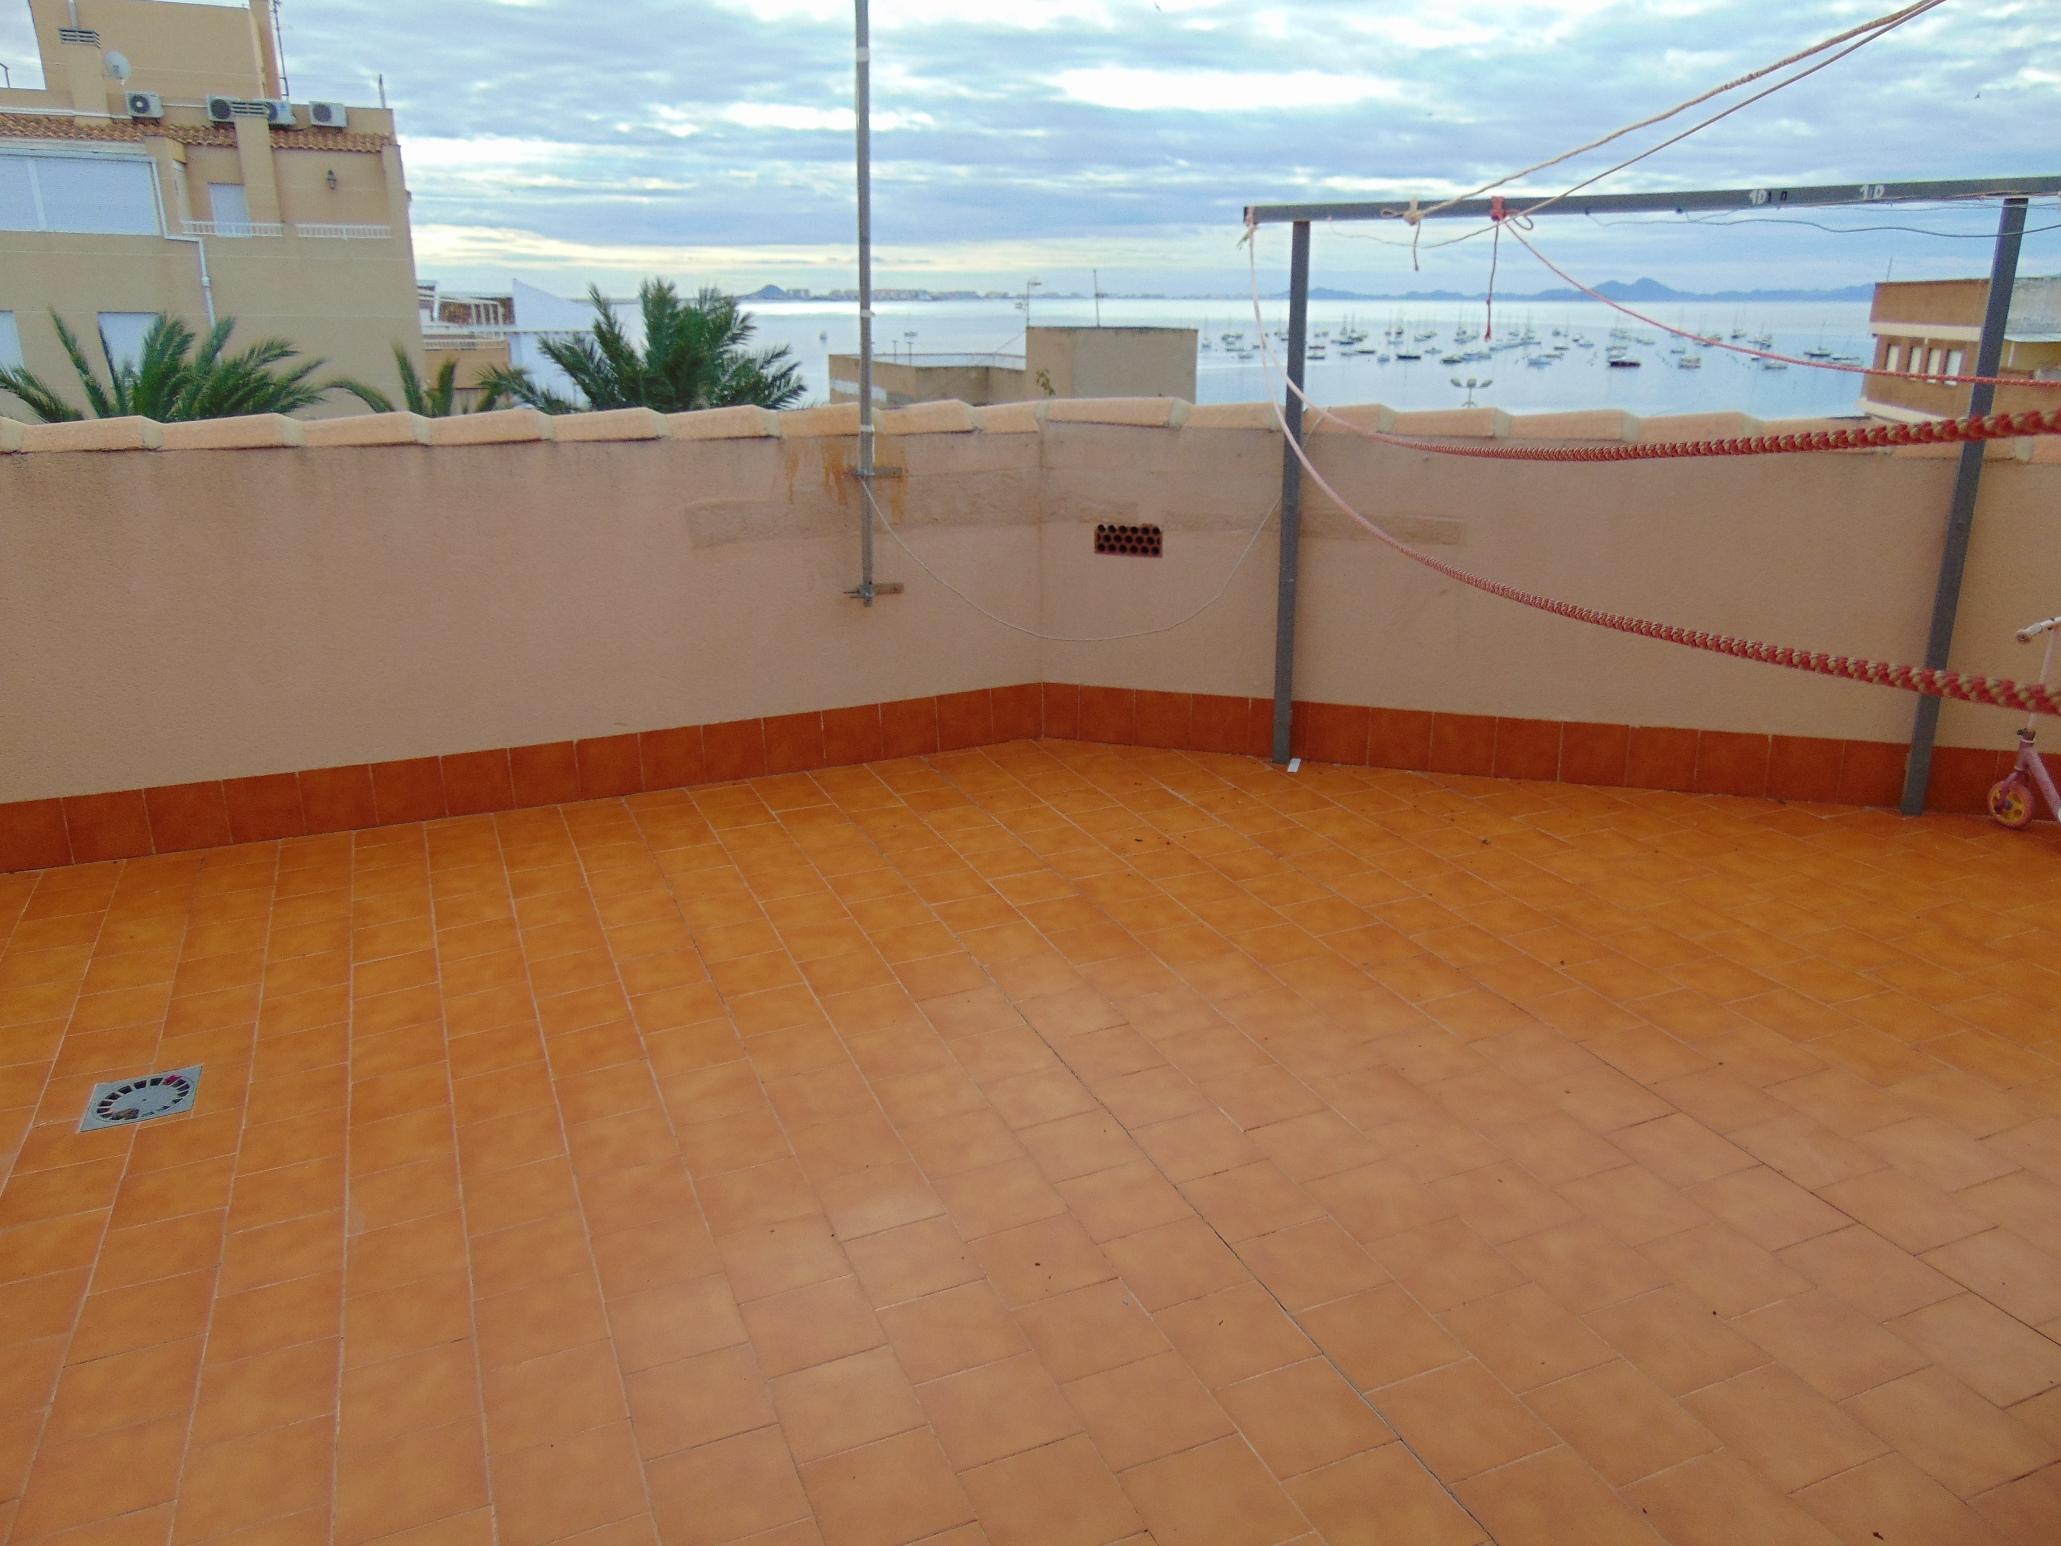 Propery For Sale in San Pedro del Pinatar, Spain image 23